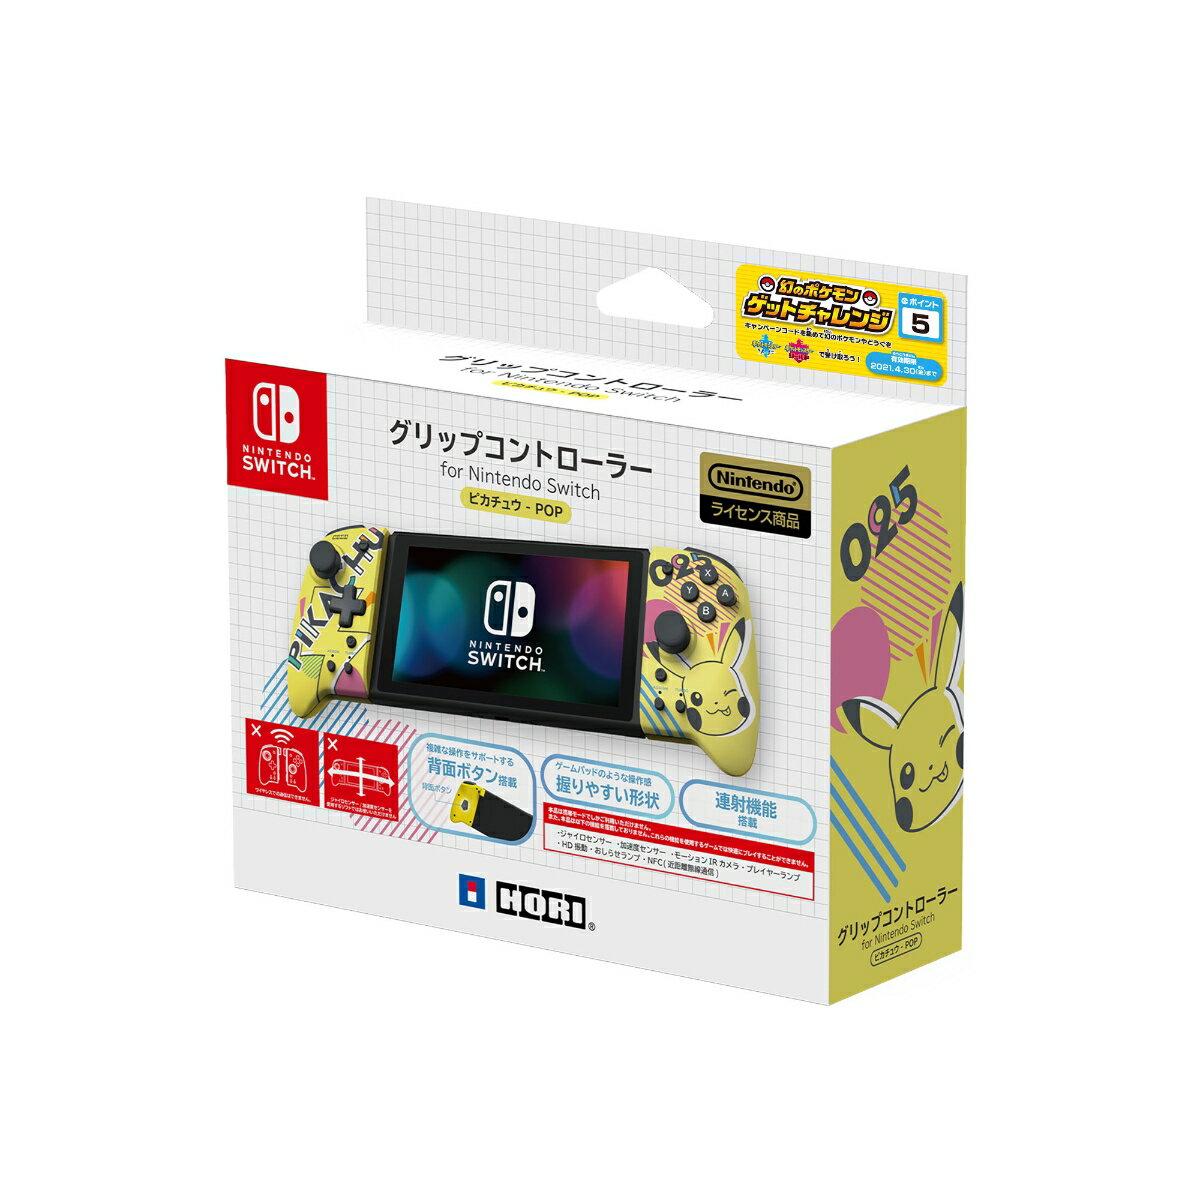 Nintendo Switch, 周辺機器  for Nintendo Switch - POP